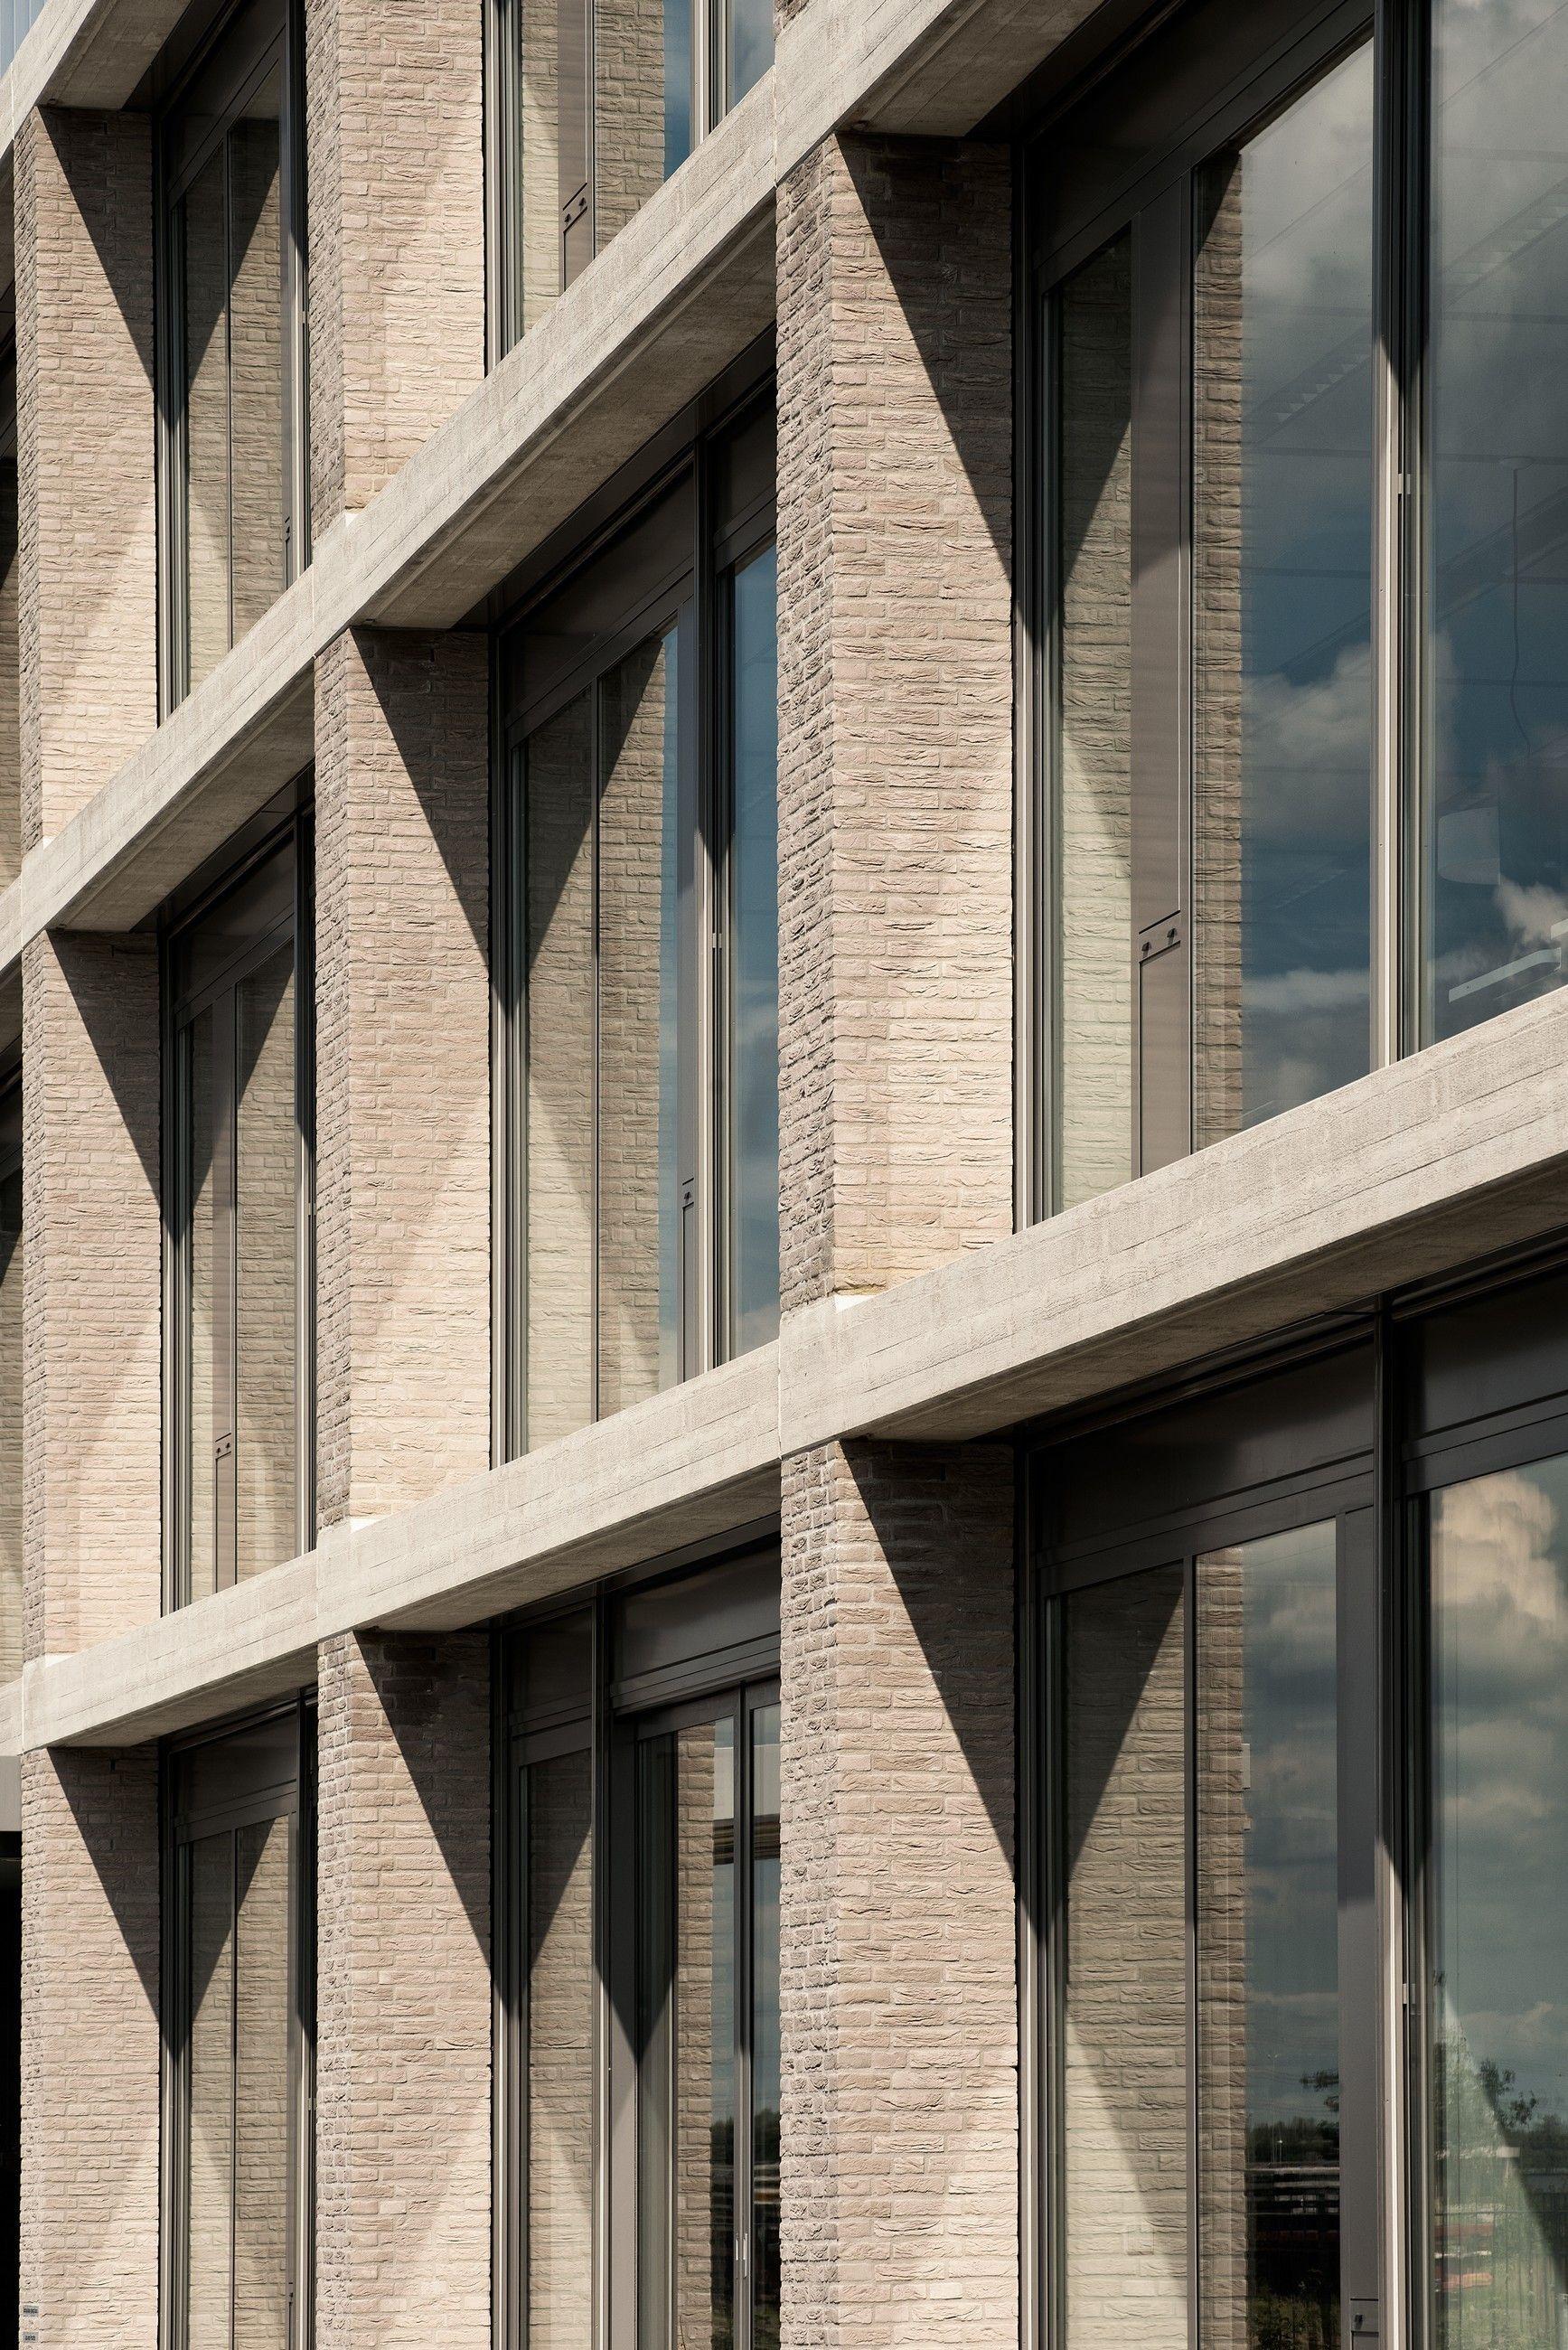 3XN — Deloitte Building — Image 1 of 23 — Europaconcorsi Glass Pinterest